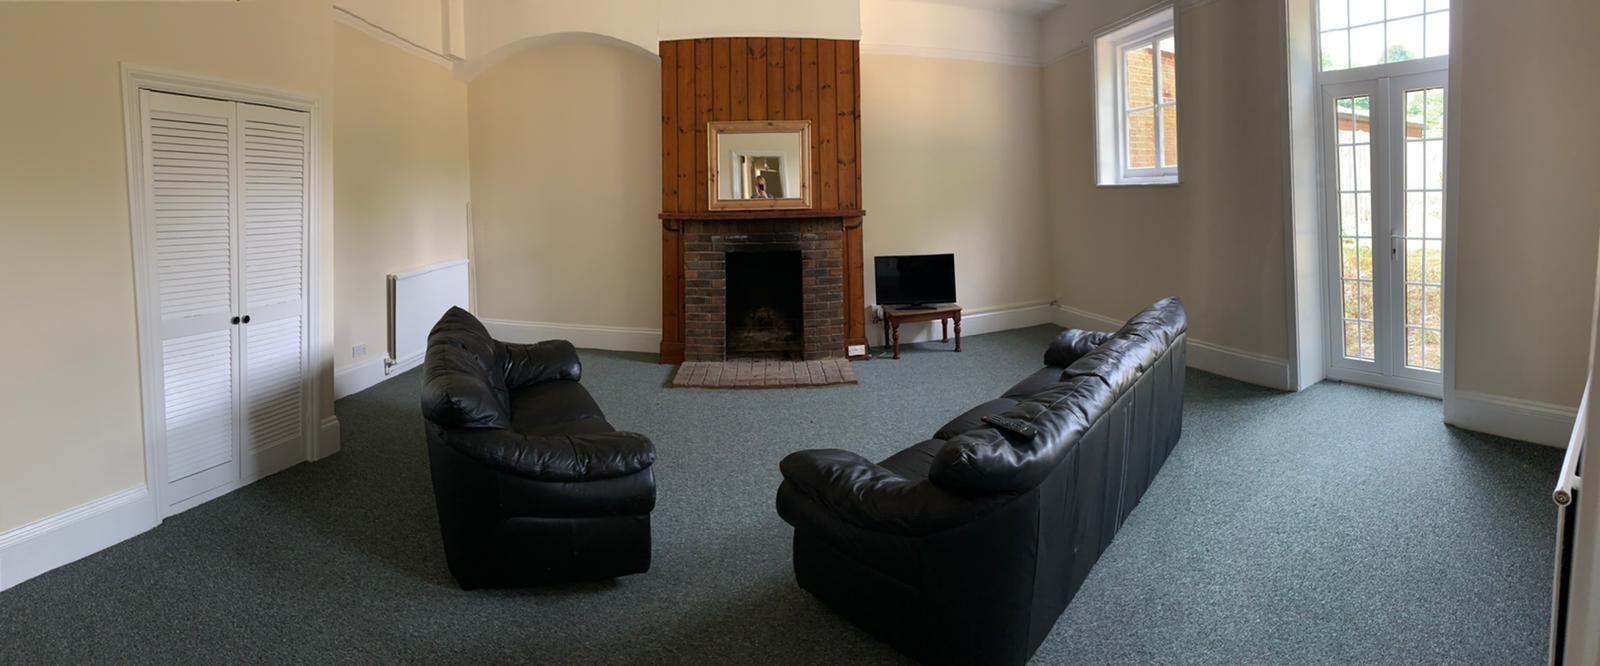 Stable Cottage, Storrington